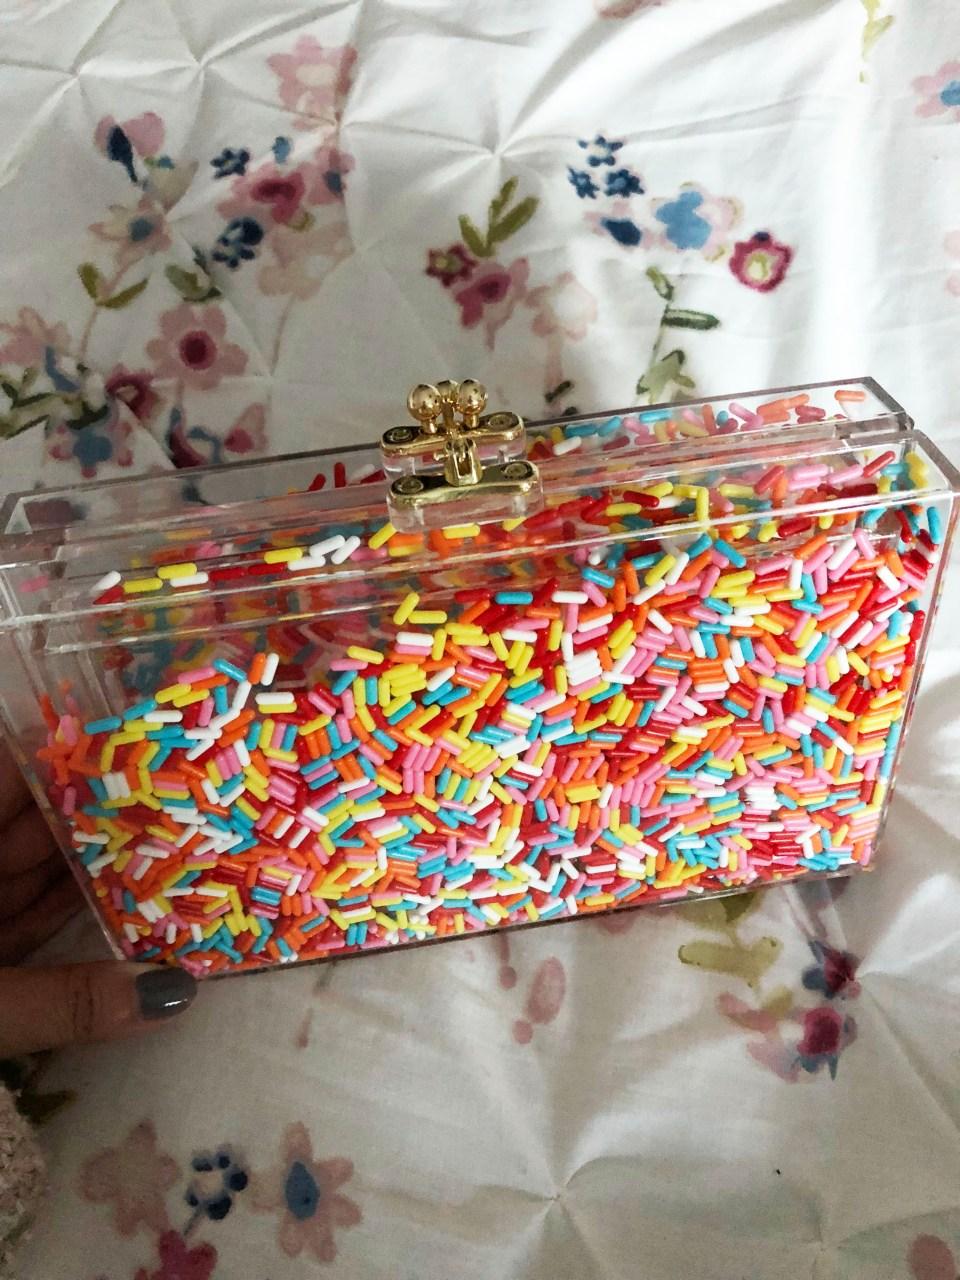 Museum of Ice Cream x Sephora - Sprinkle Clutch 3